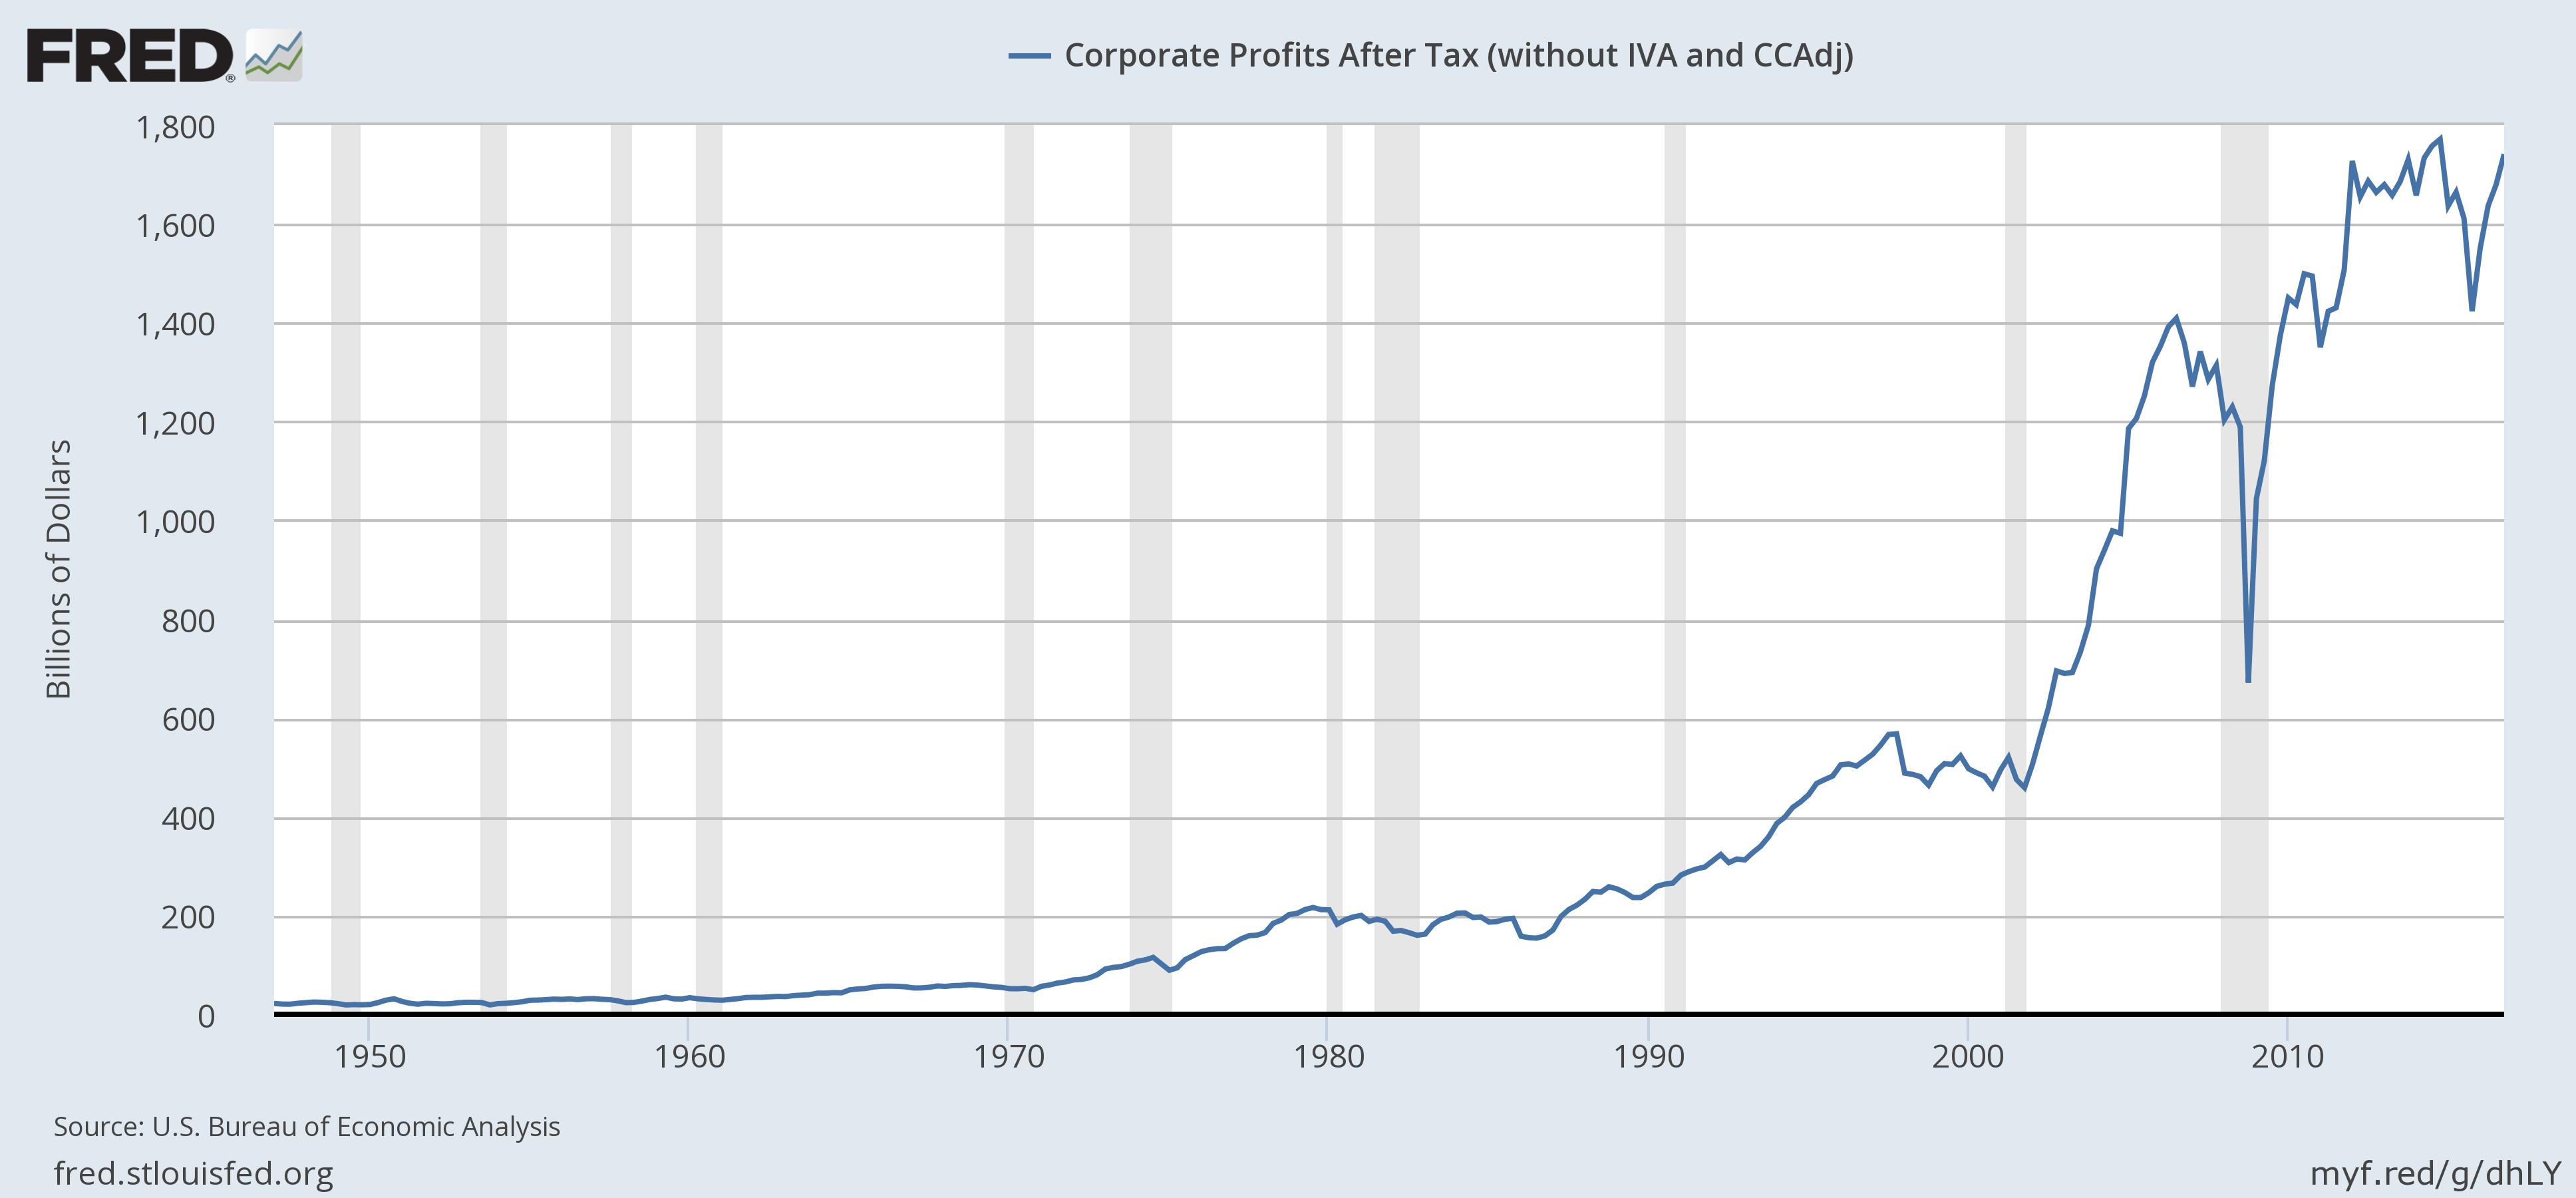 US Corporate Profits After Tax, 1950 - 2017